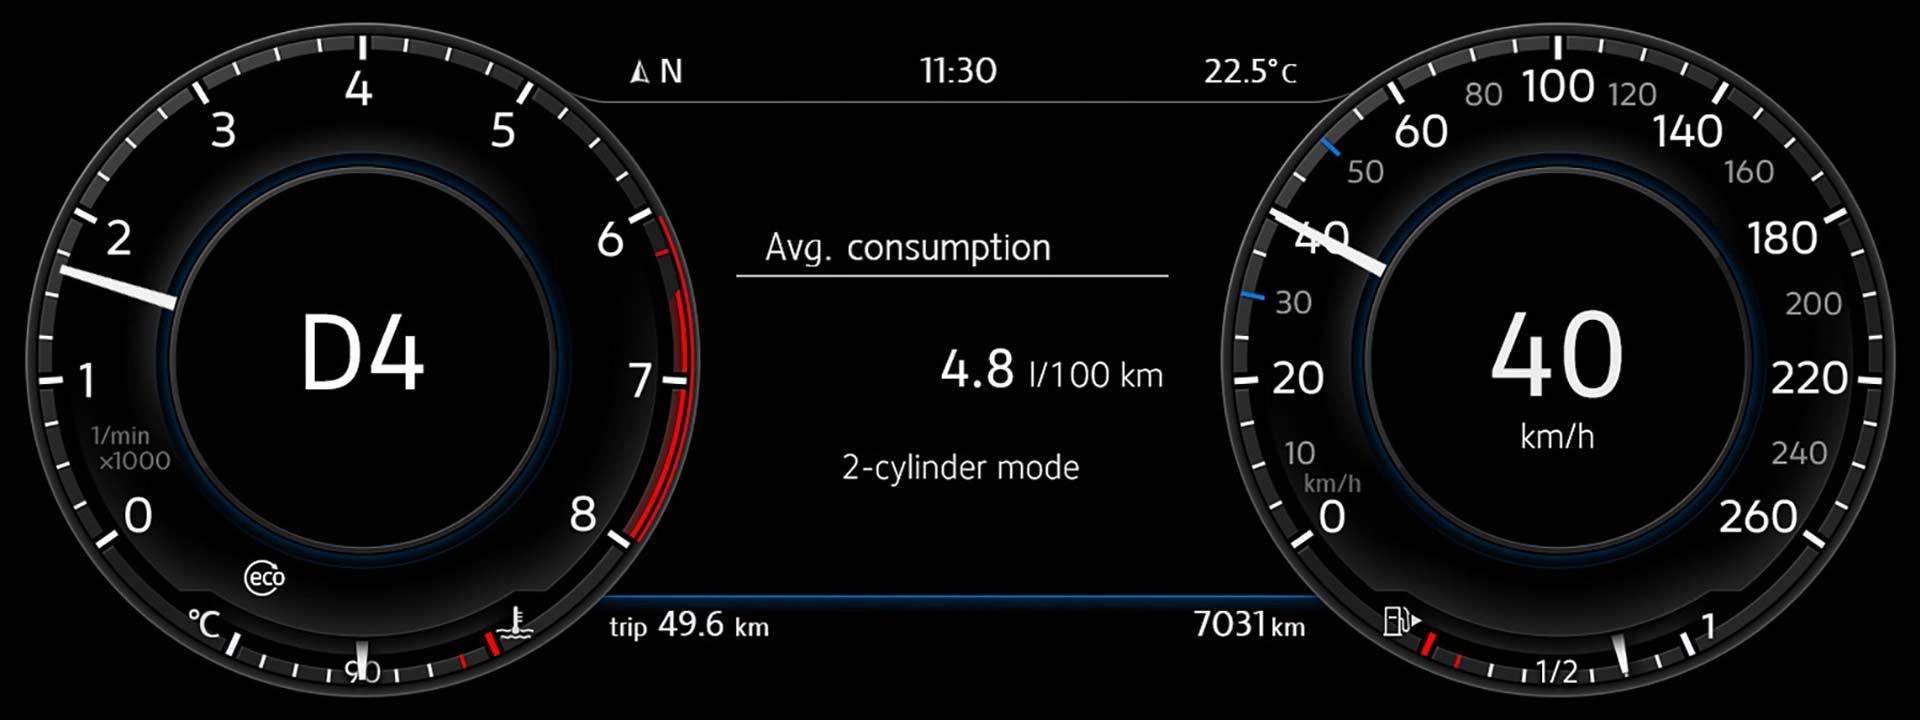 Volkswagen-Golf-130-PS-1.5-TSI-ACT-BlueMotion-instrument-cluster_2